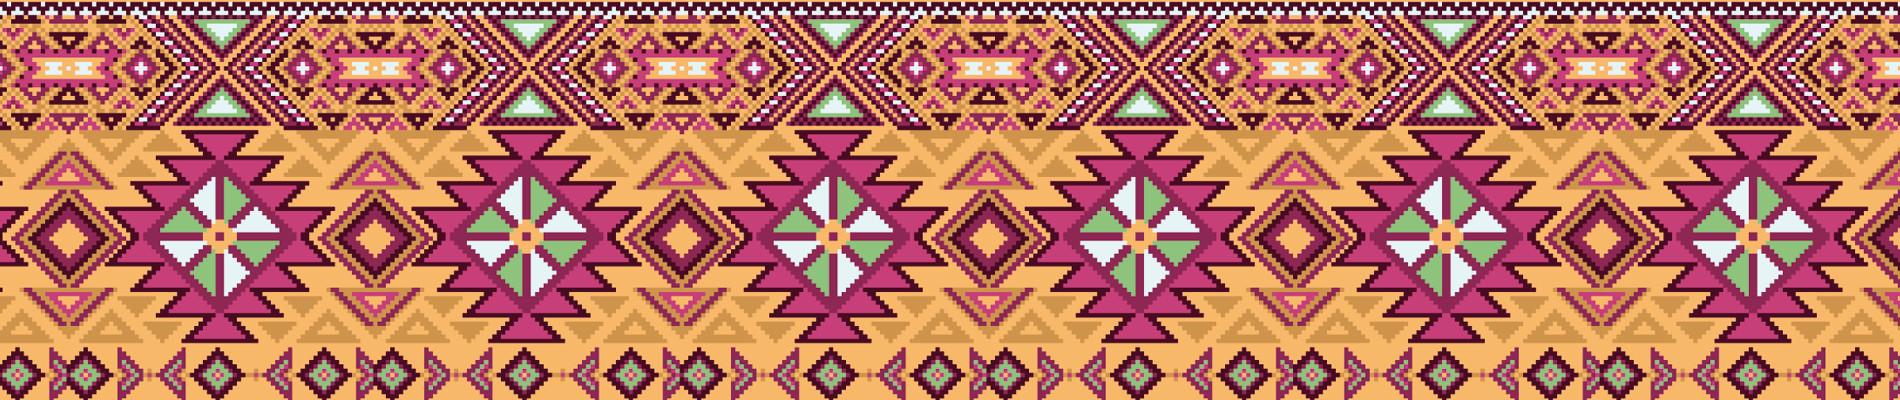 Hippi Marrakech